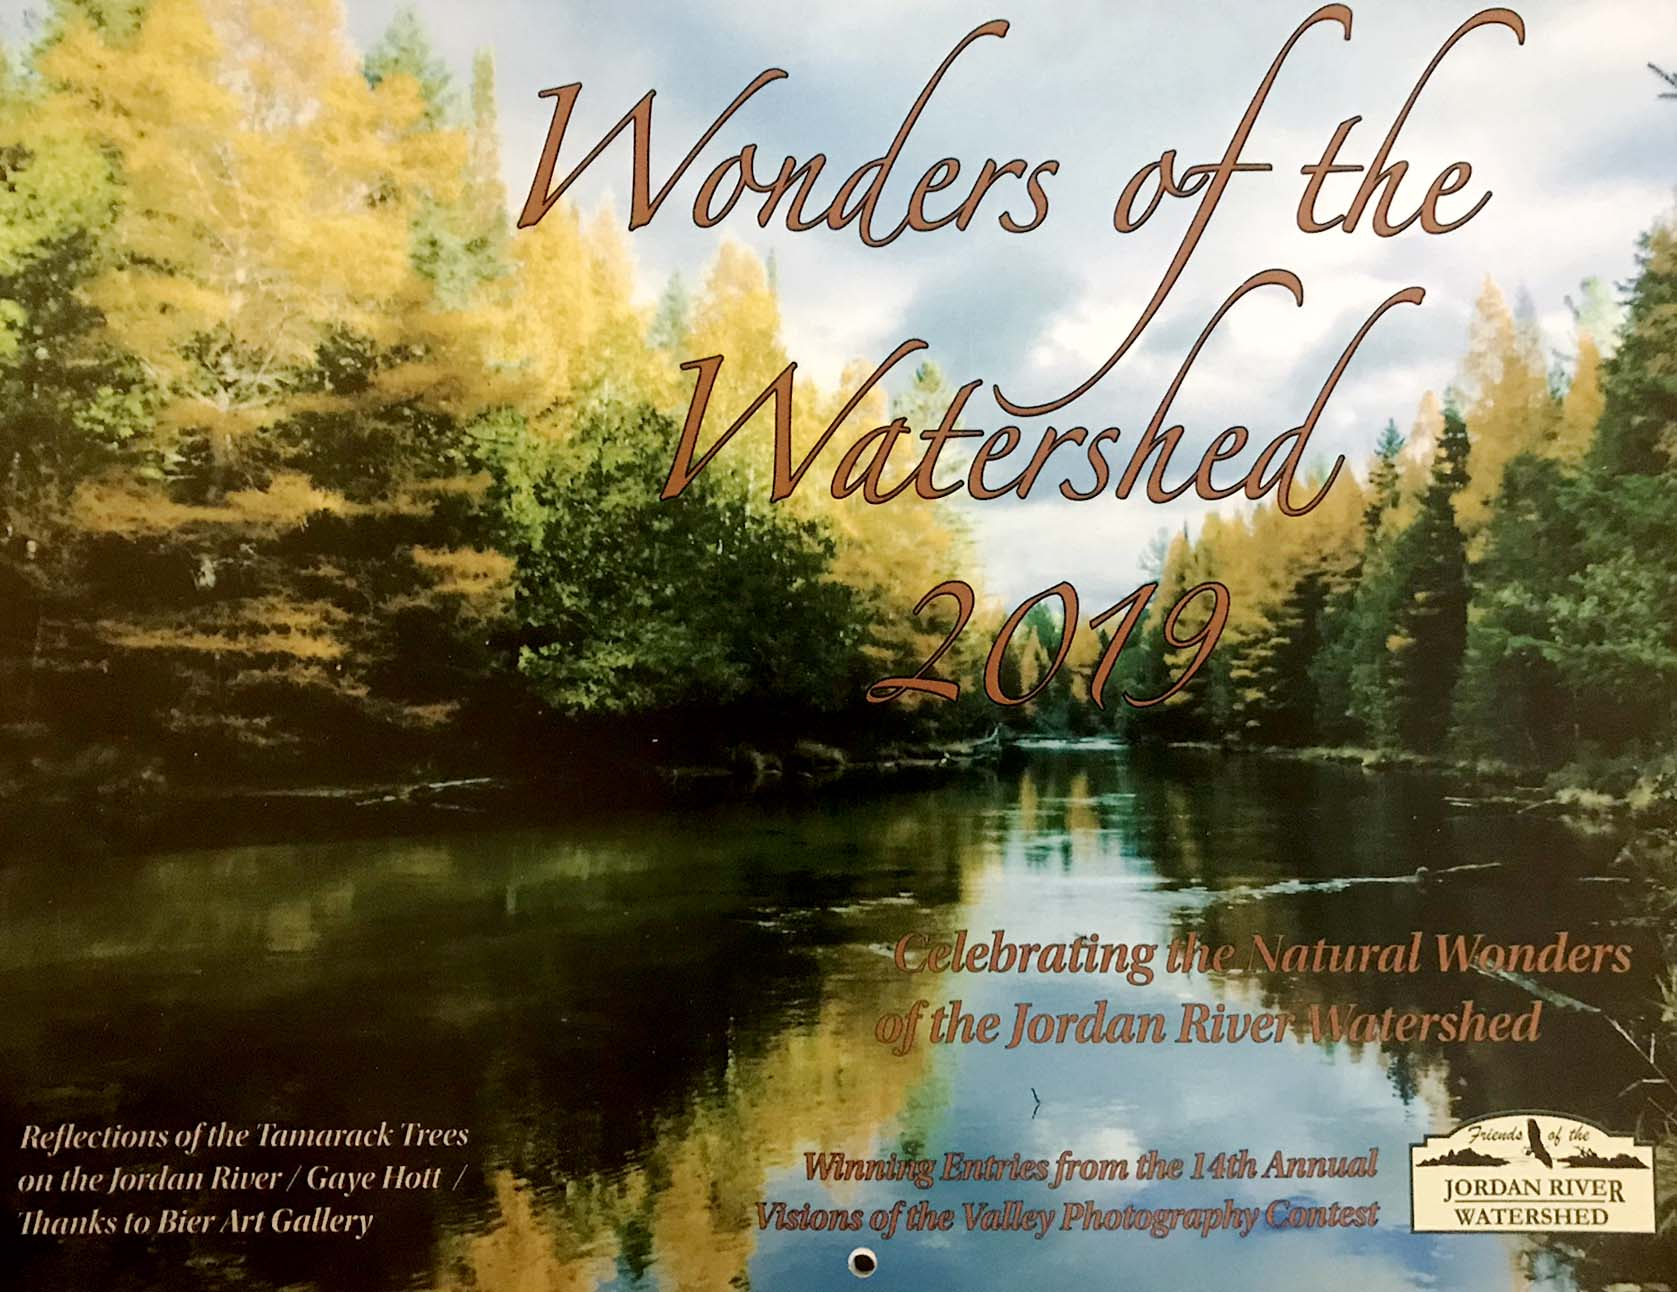 Calendar Cover Photo